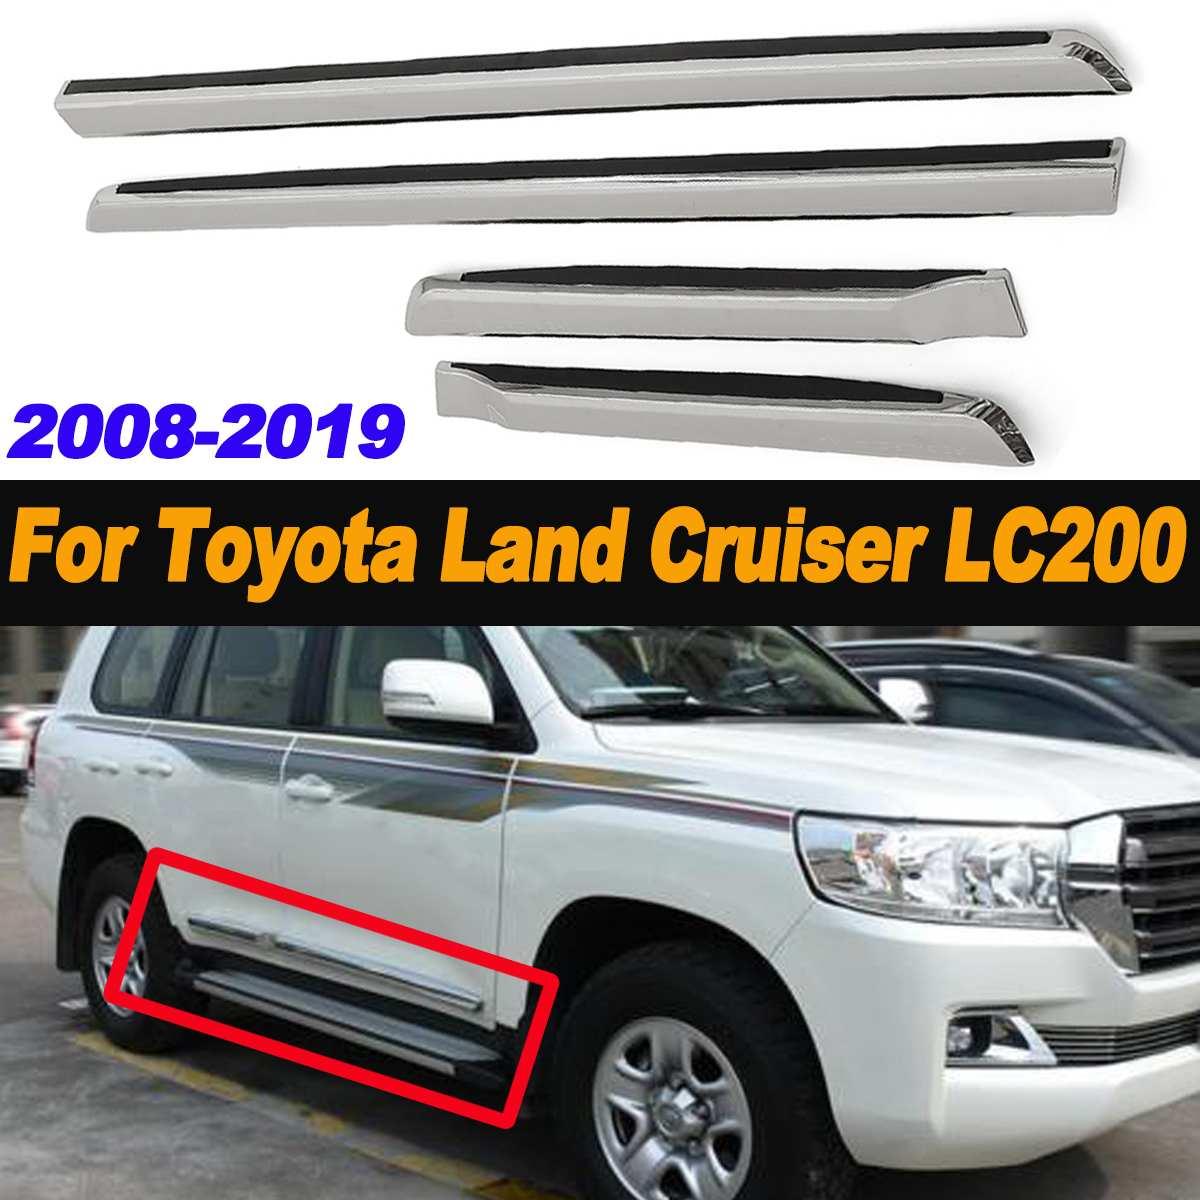 Door Body Side Cover for Toyota Land Cruiser J200 2016-2018 Chrome Molding Trim